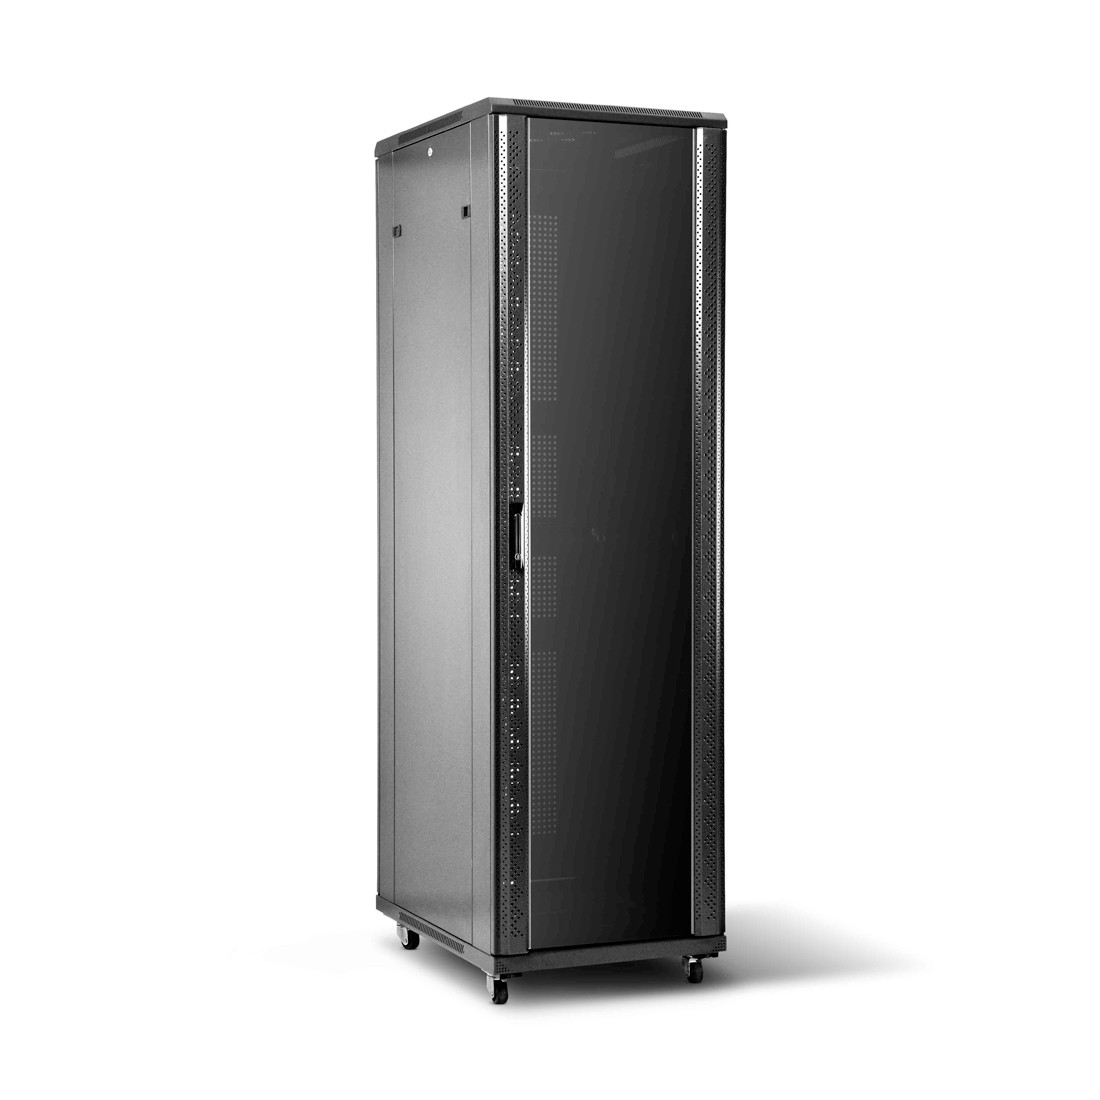 Шкаф серверный SHIP 601S.6024.24.100 24U 600*1000*1200 мм